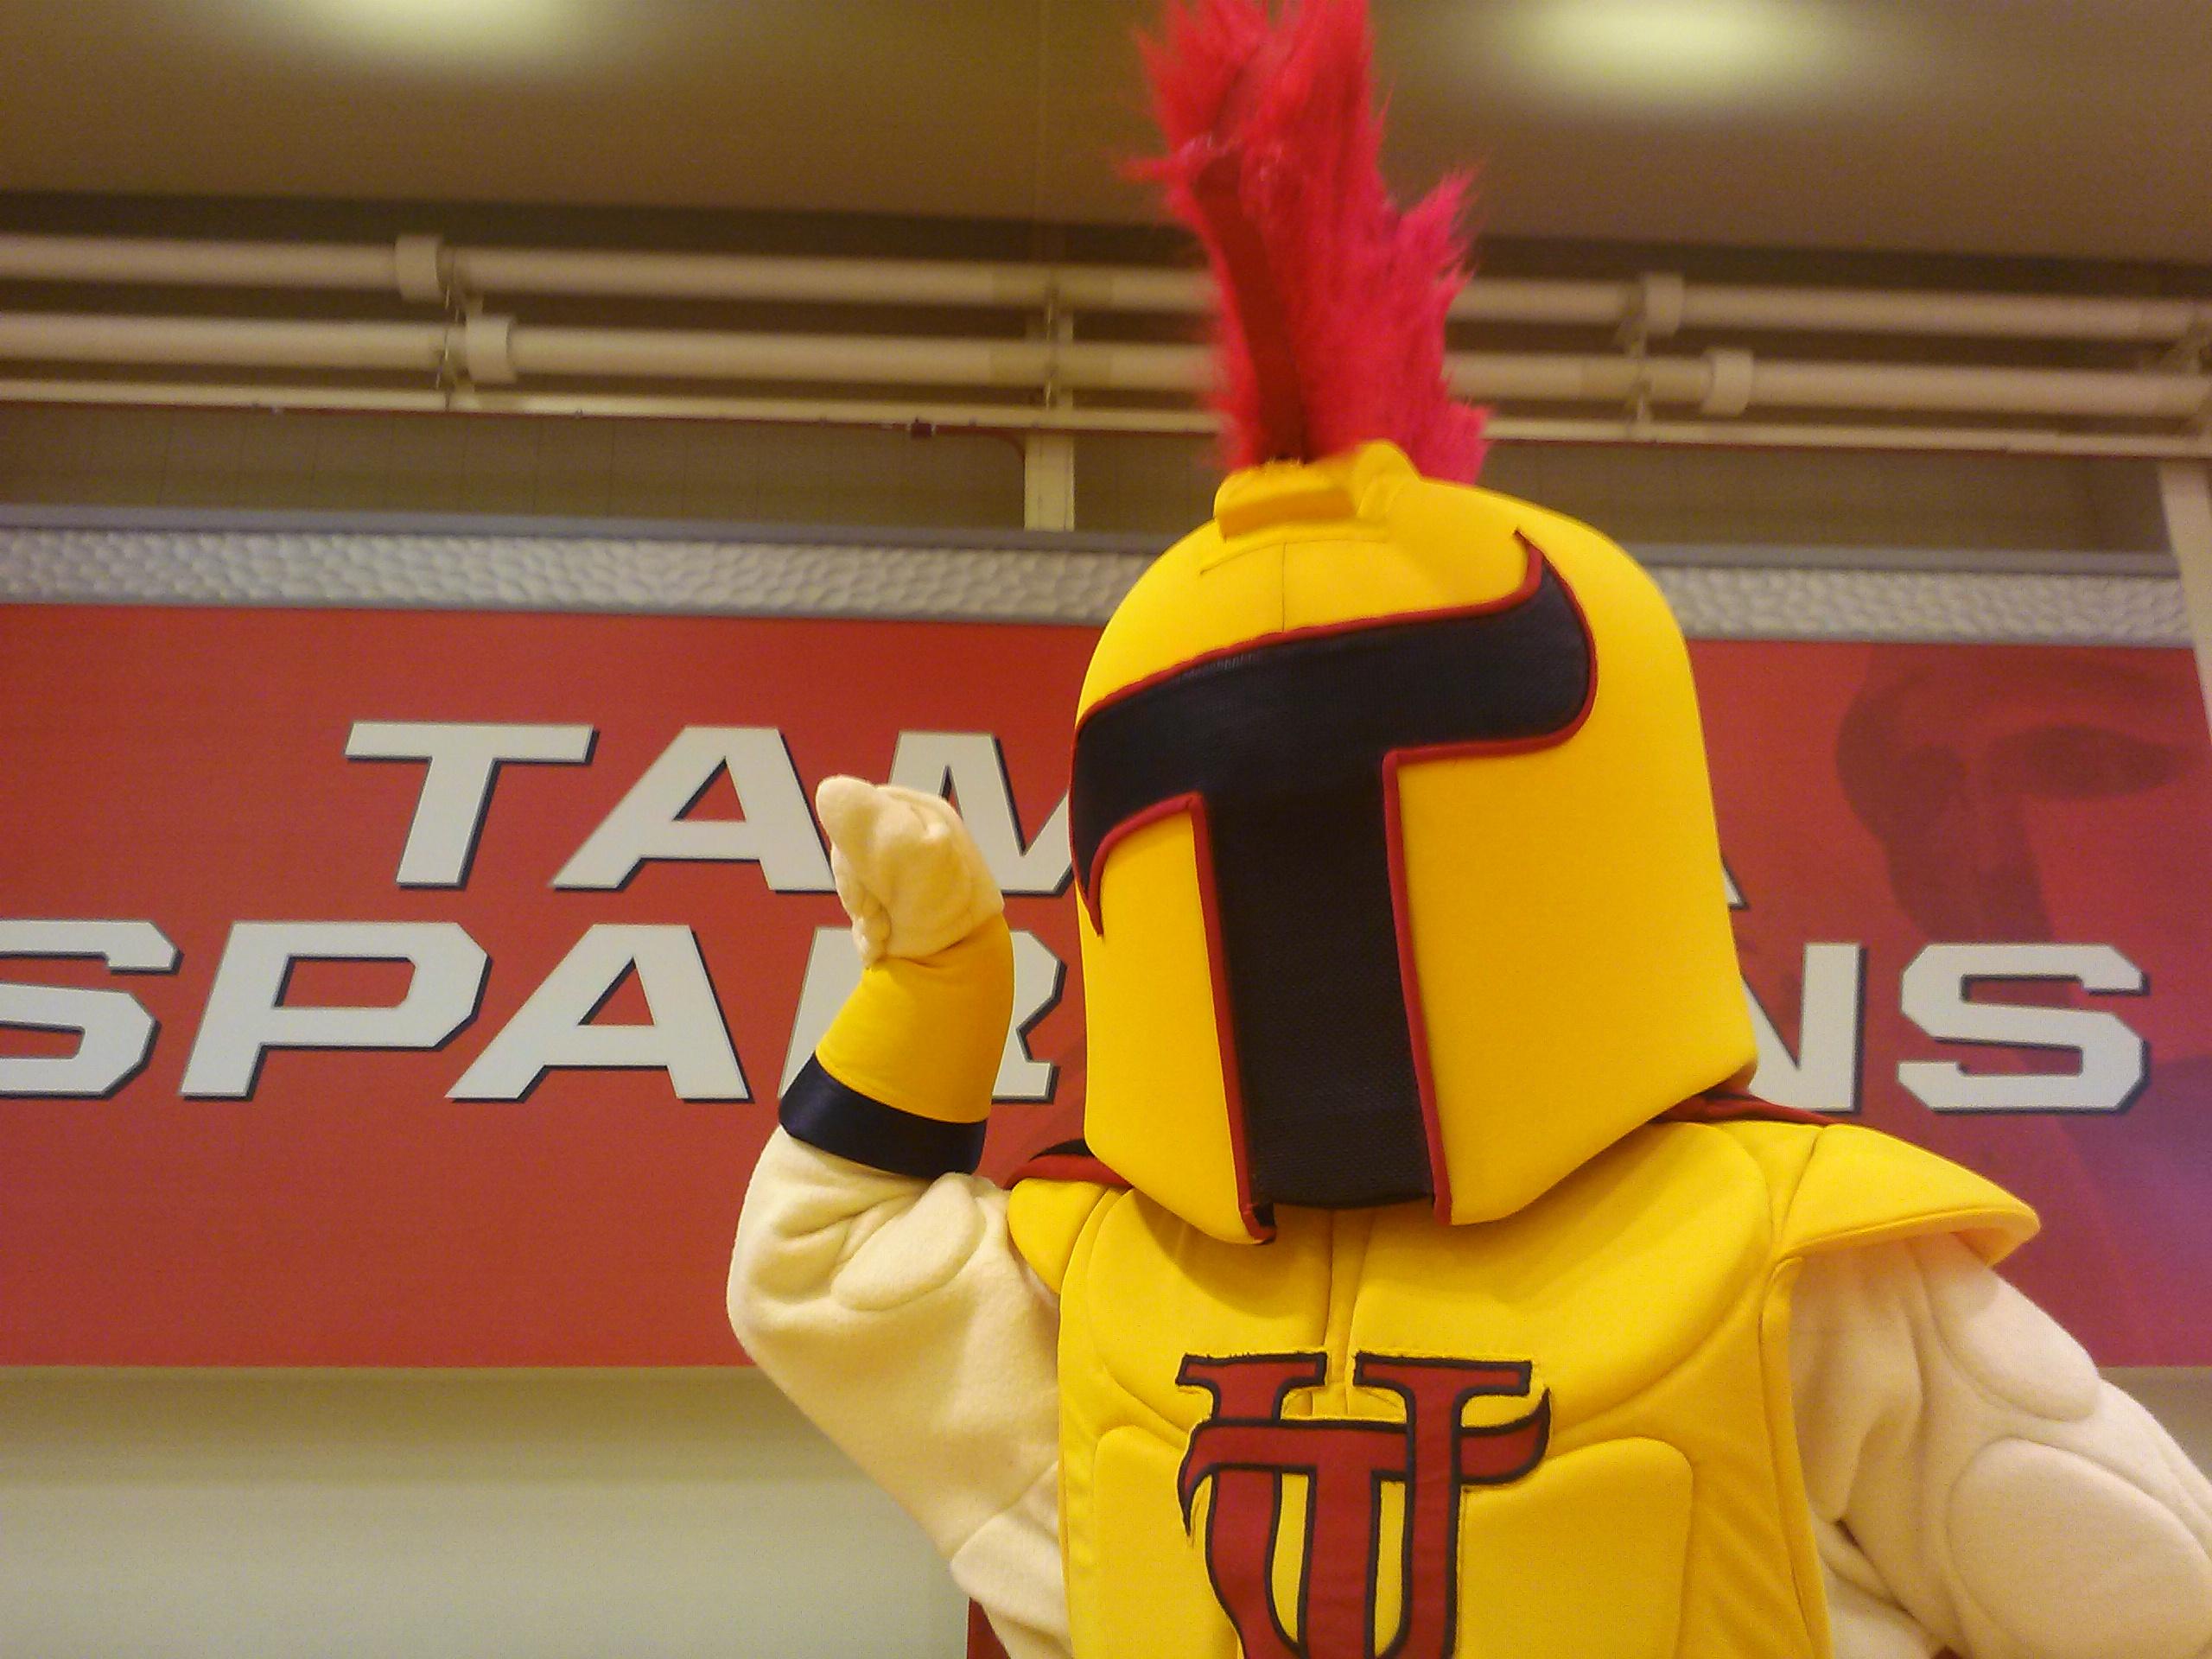 University of tampa 1